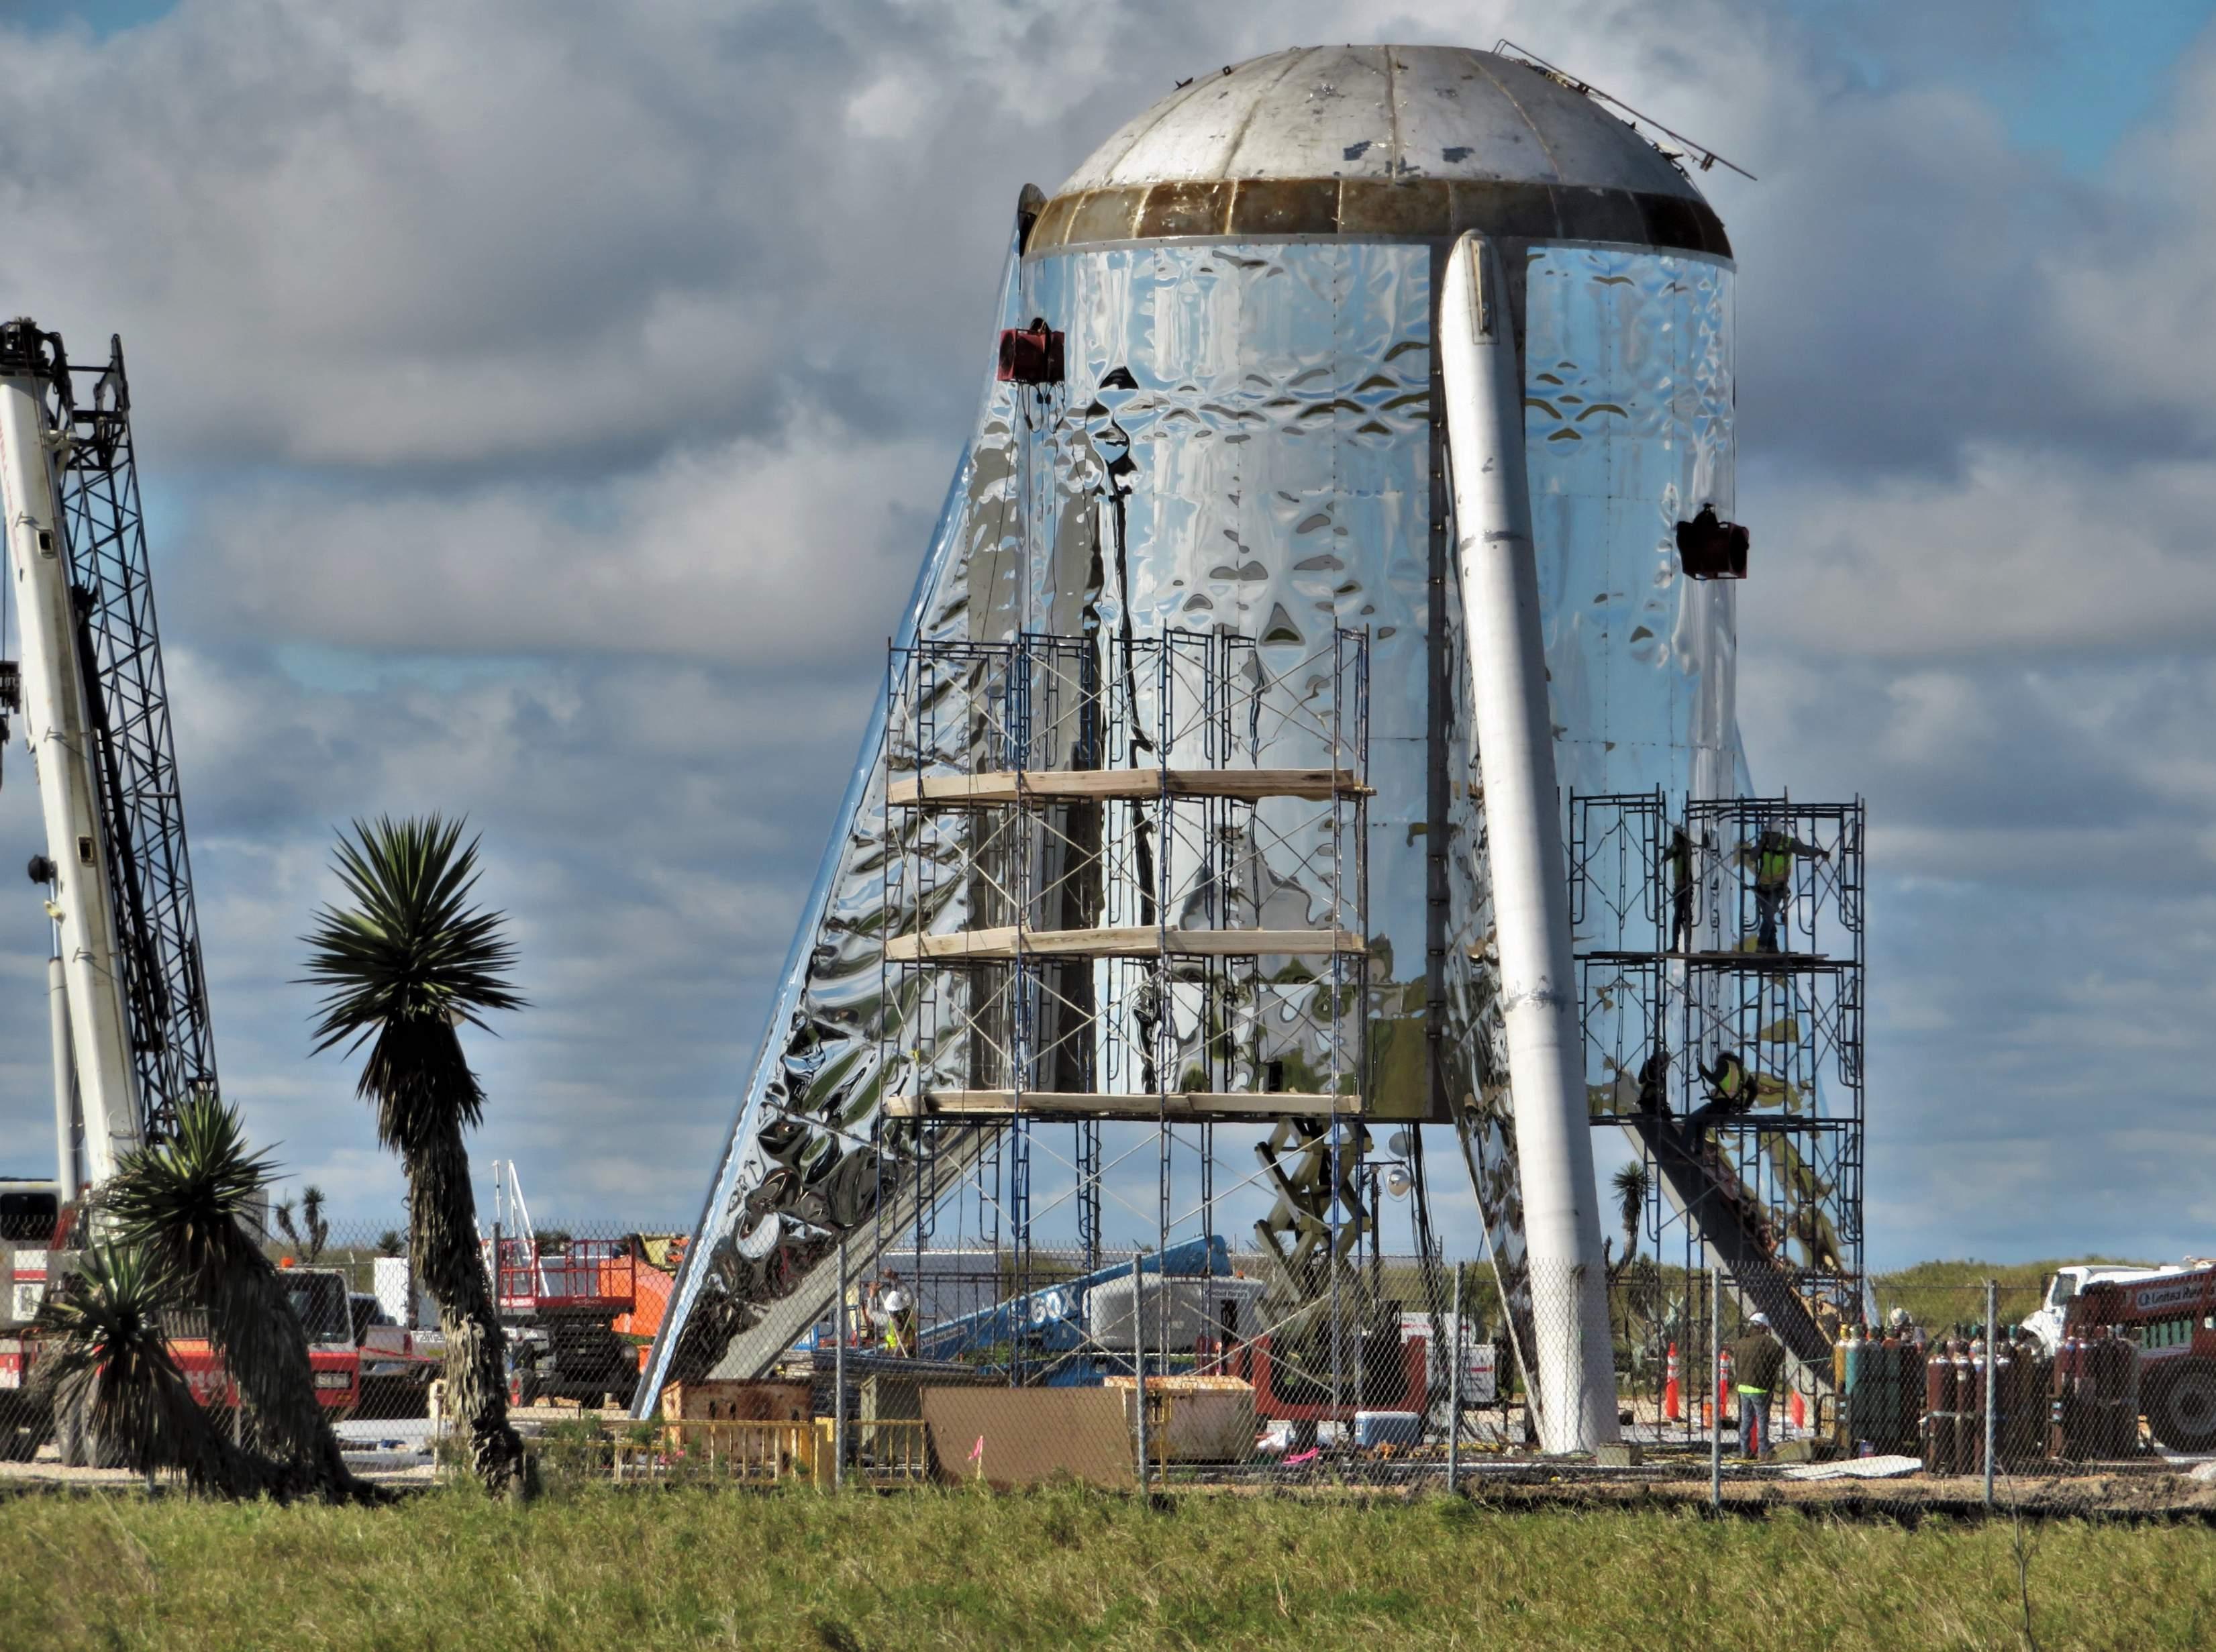 Boca Chica Starship dome work 012719 (NASASpaceflight – bocachicagal) 1 (c)